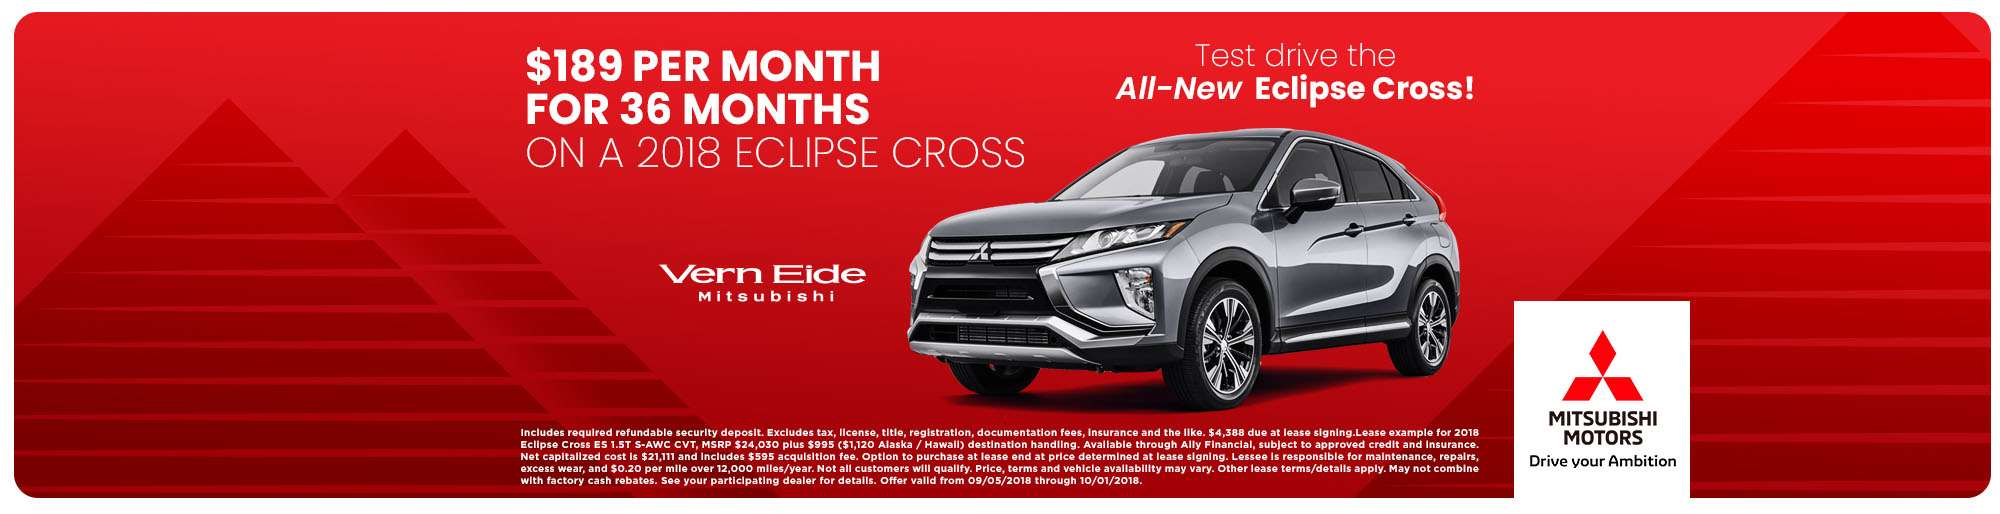 2018 Eclipse Cross - $189/mo 36 - Sept 2018